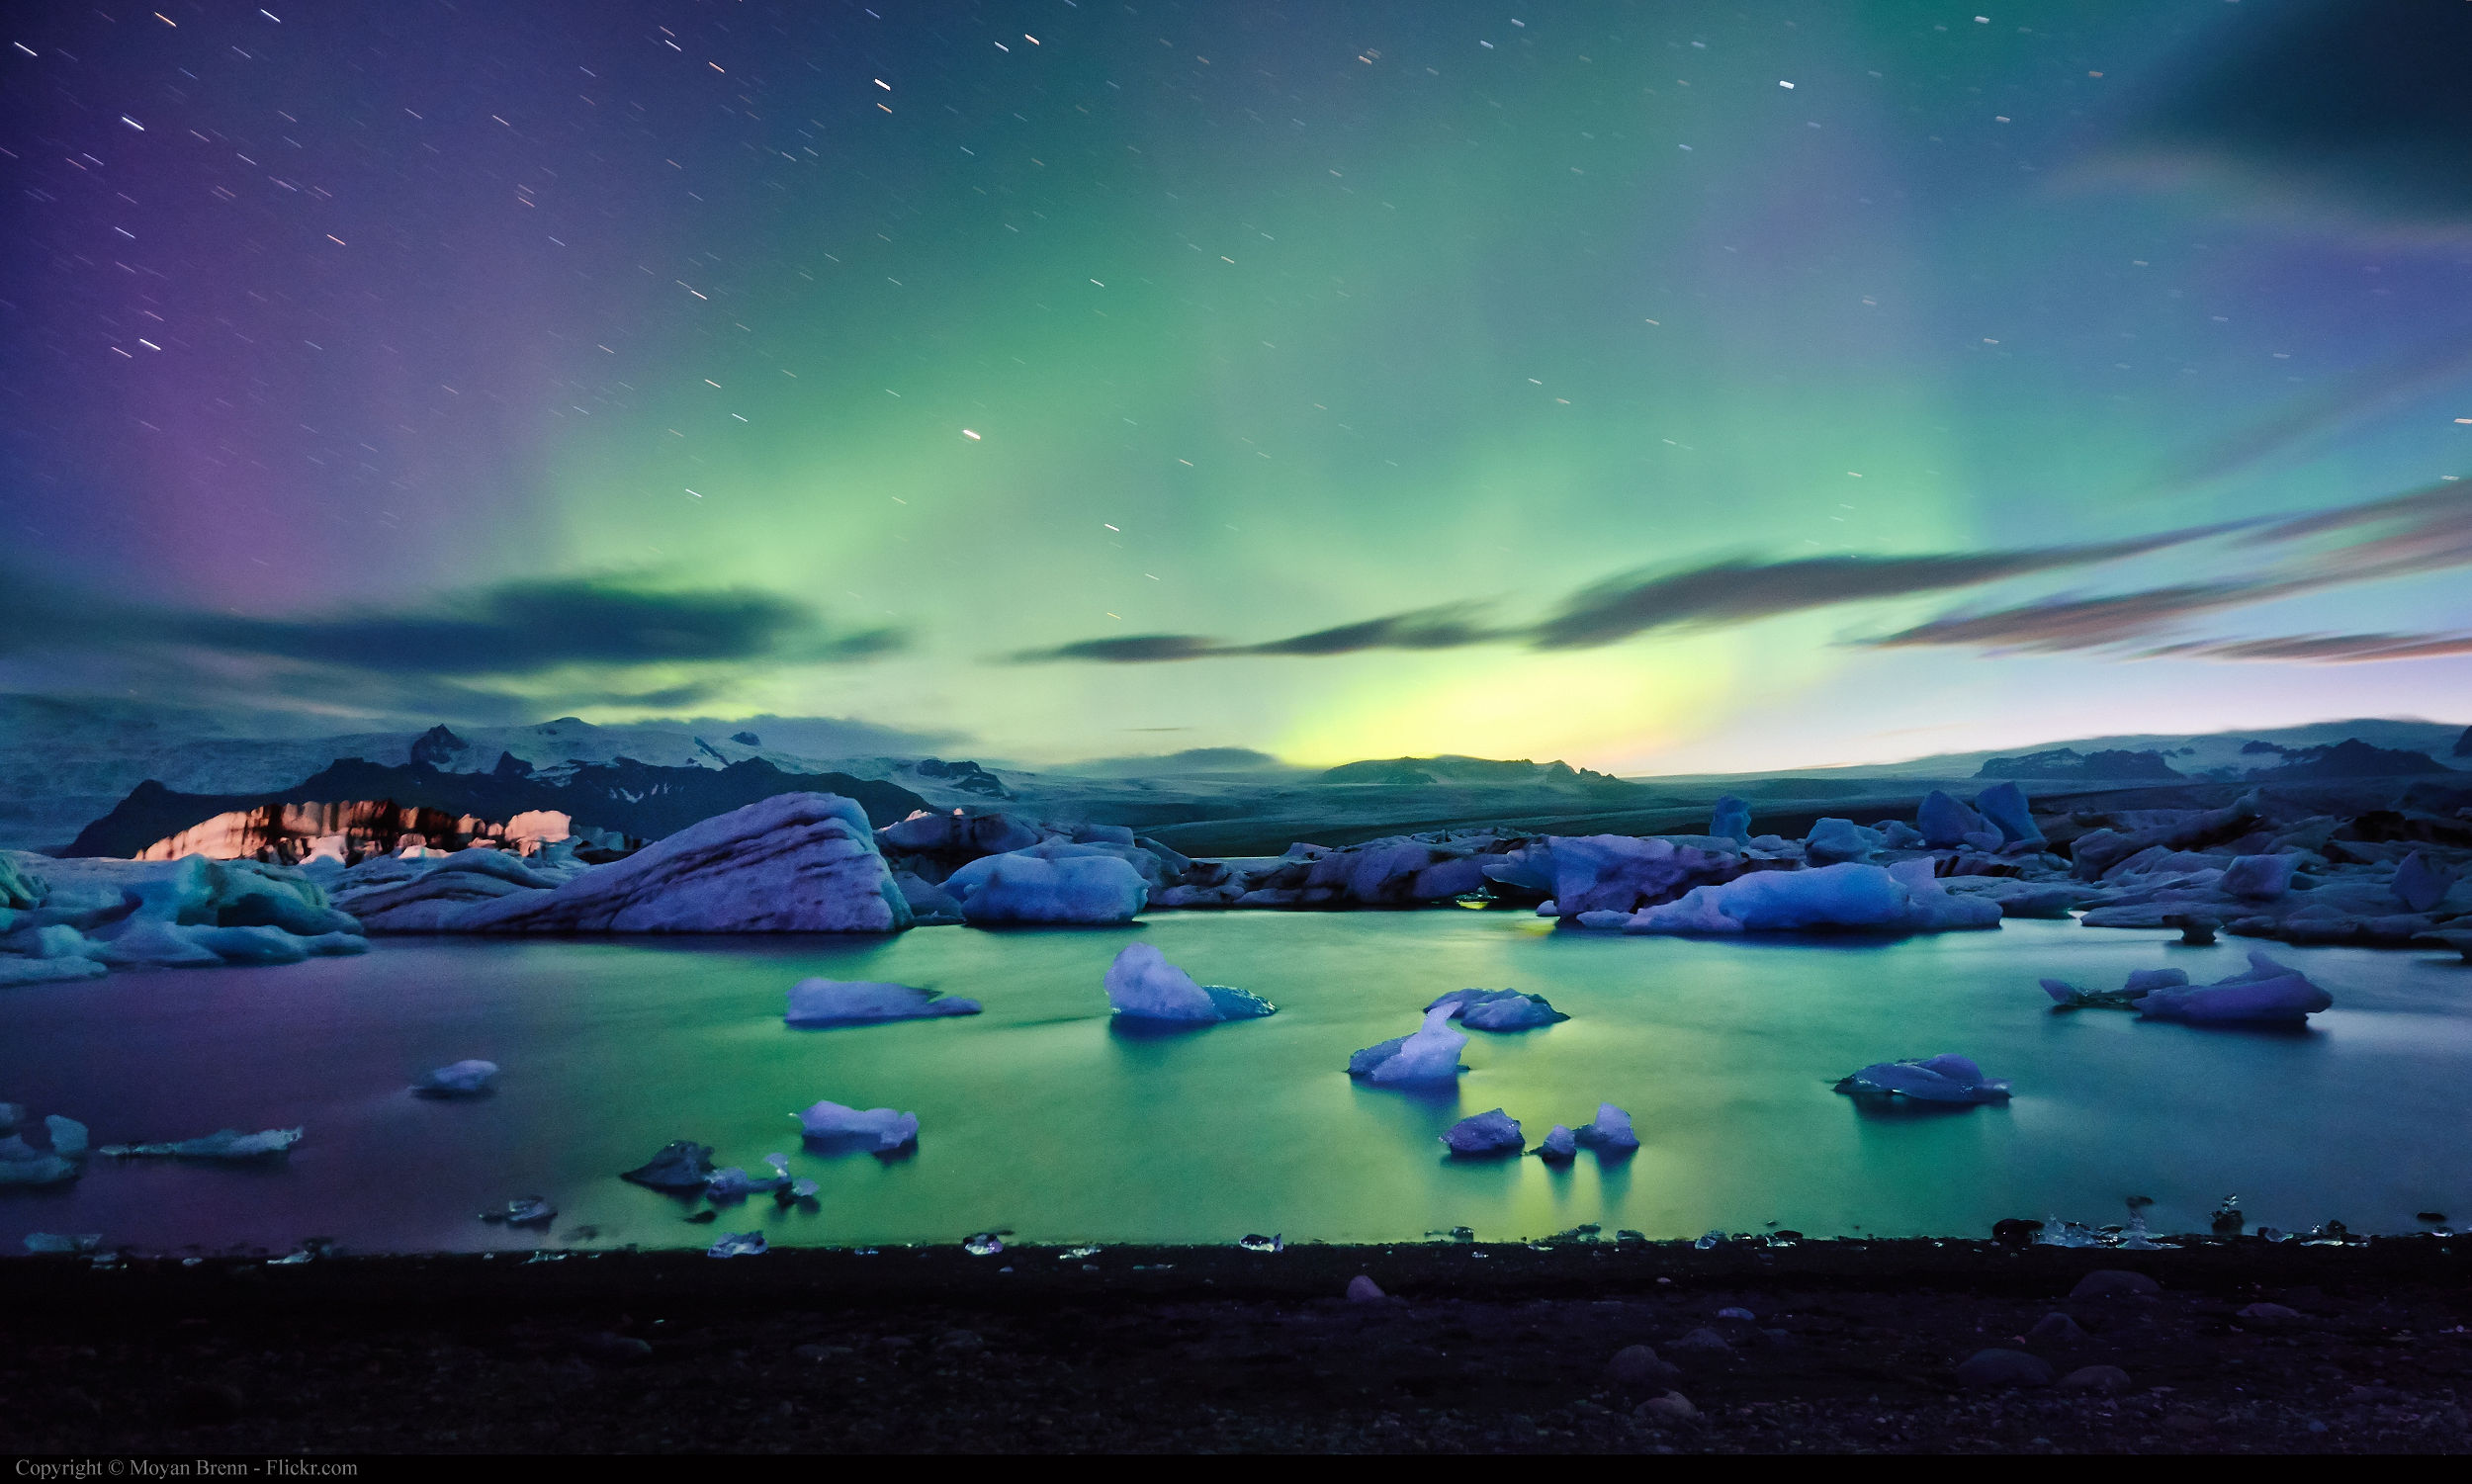 Aurora boreal vista a partir do lago Jokulsarlon, na Islândia (foto: Moyan Brenn/Flickr-Creative Commons)